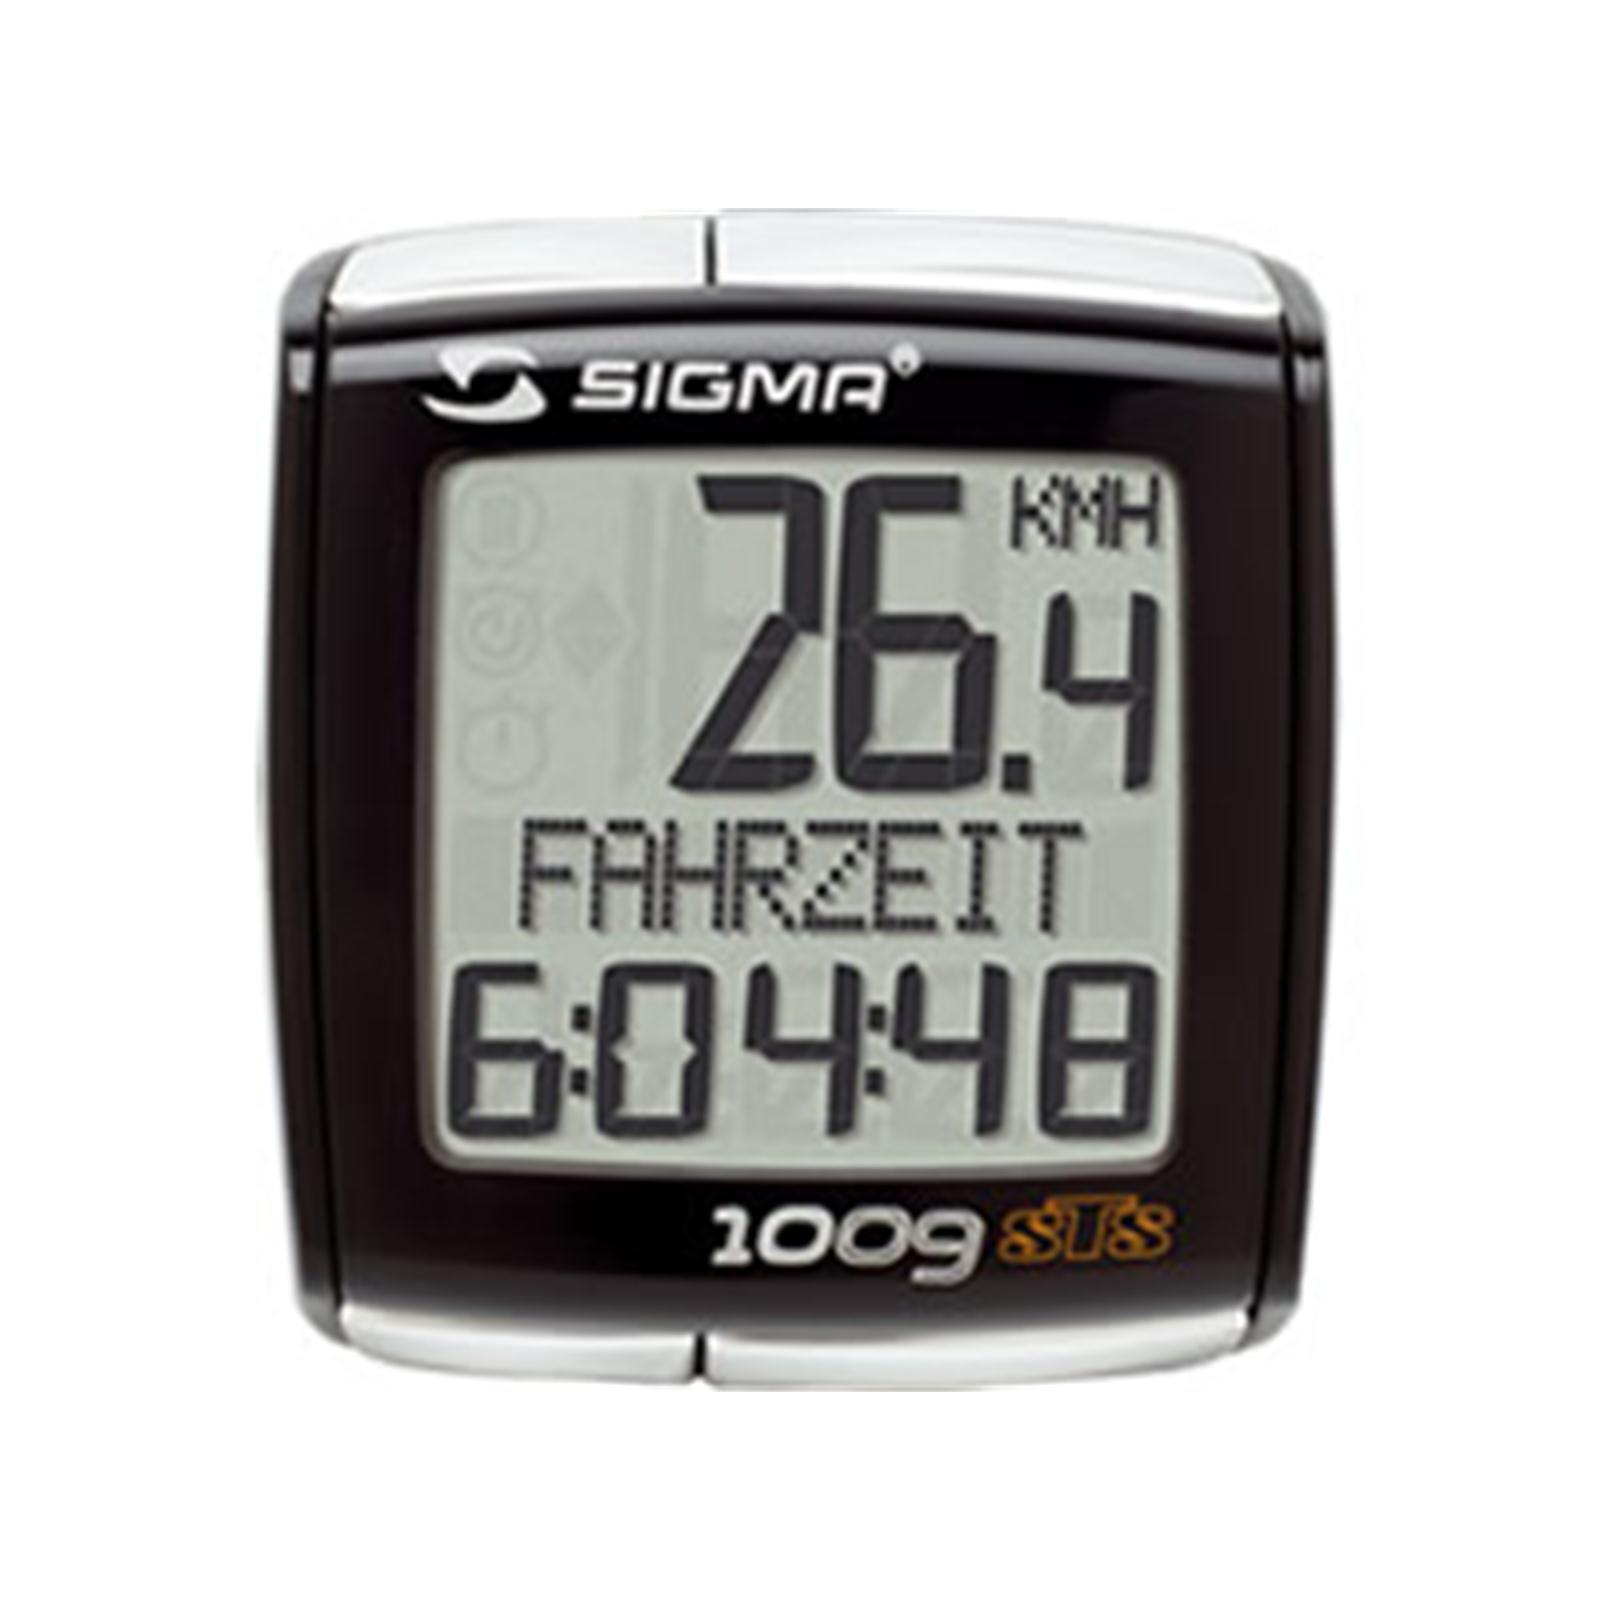 Sigma Sport bc 1009 STS inalámbrico bicicleta equipo radio bicicleta velocímetro PC inalámbrica